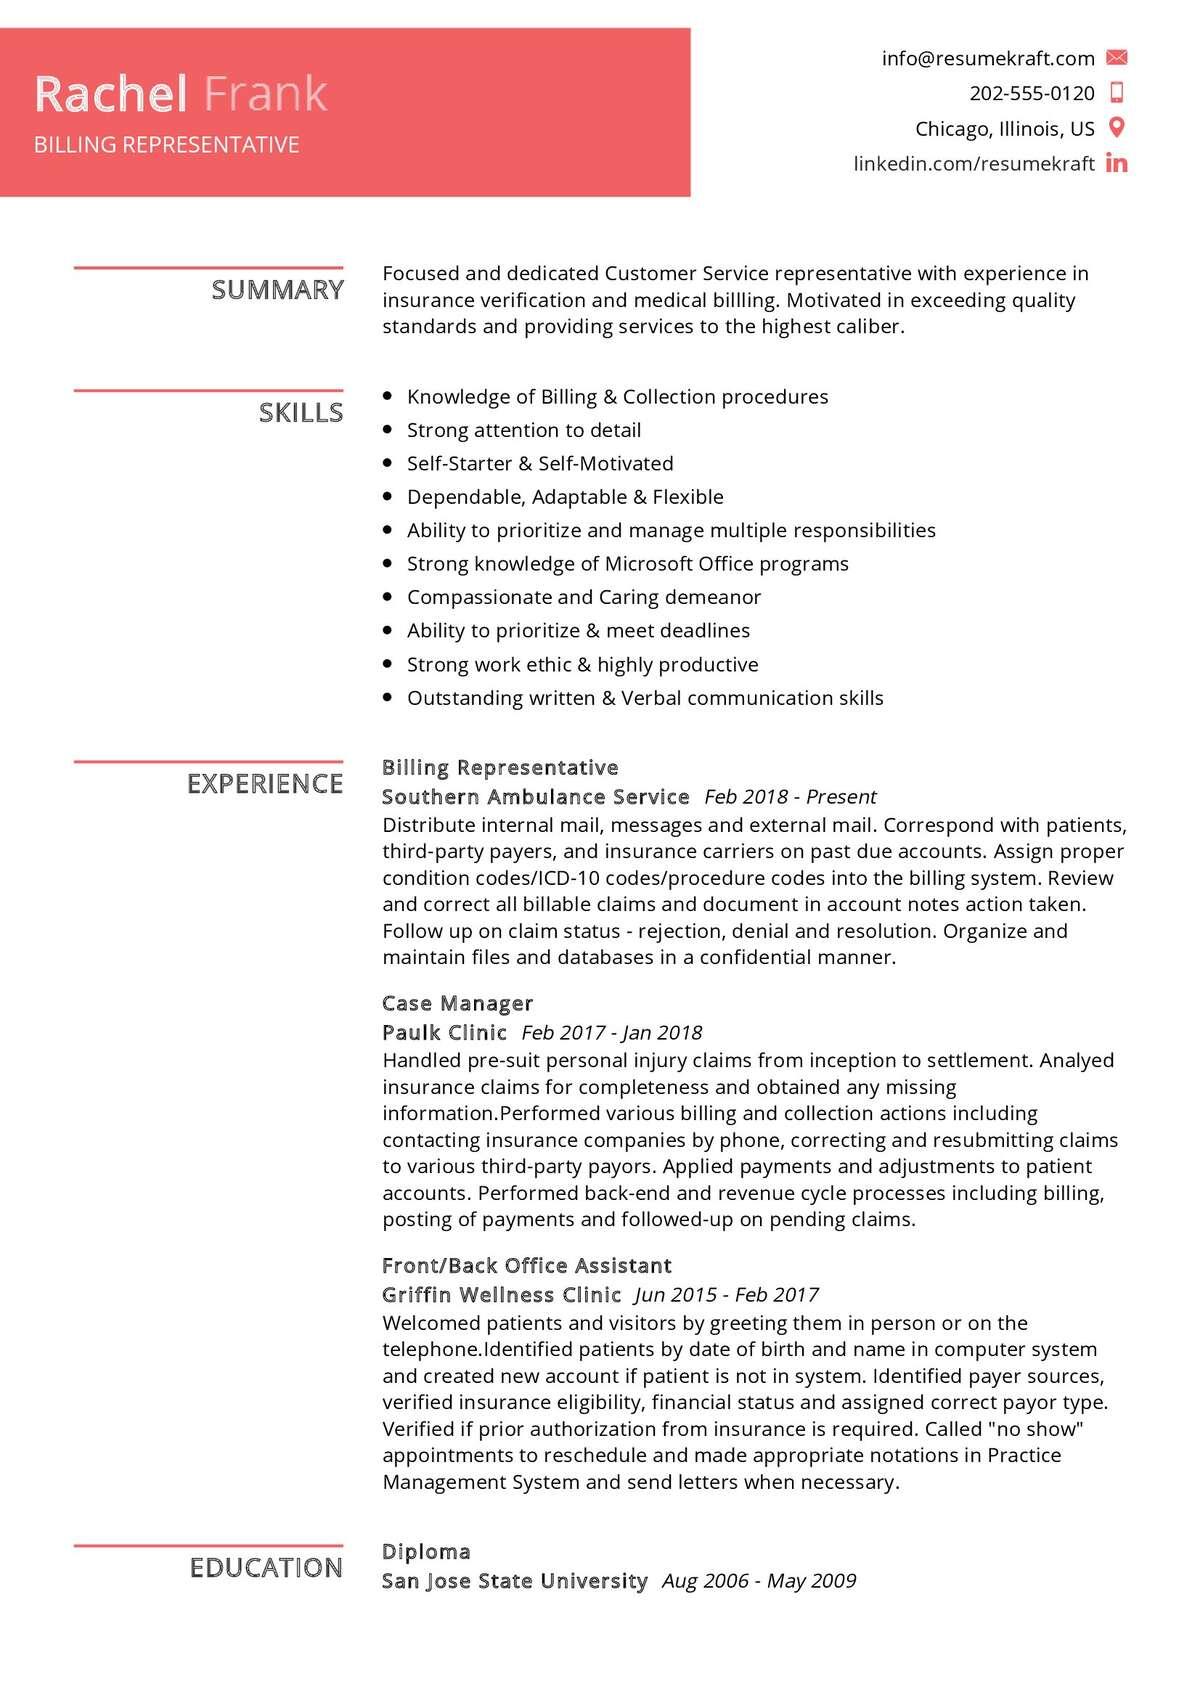 Billing Representative Resume Sample